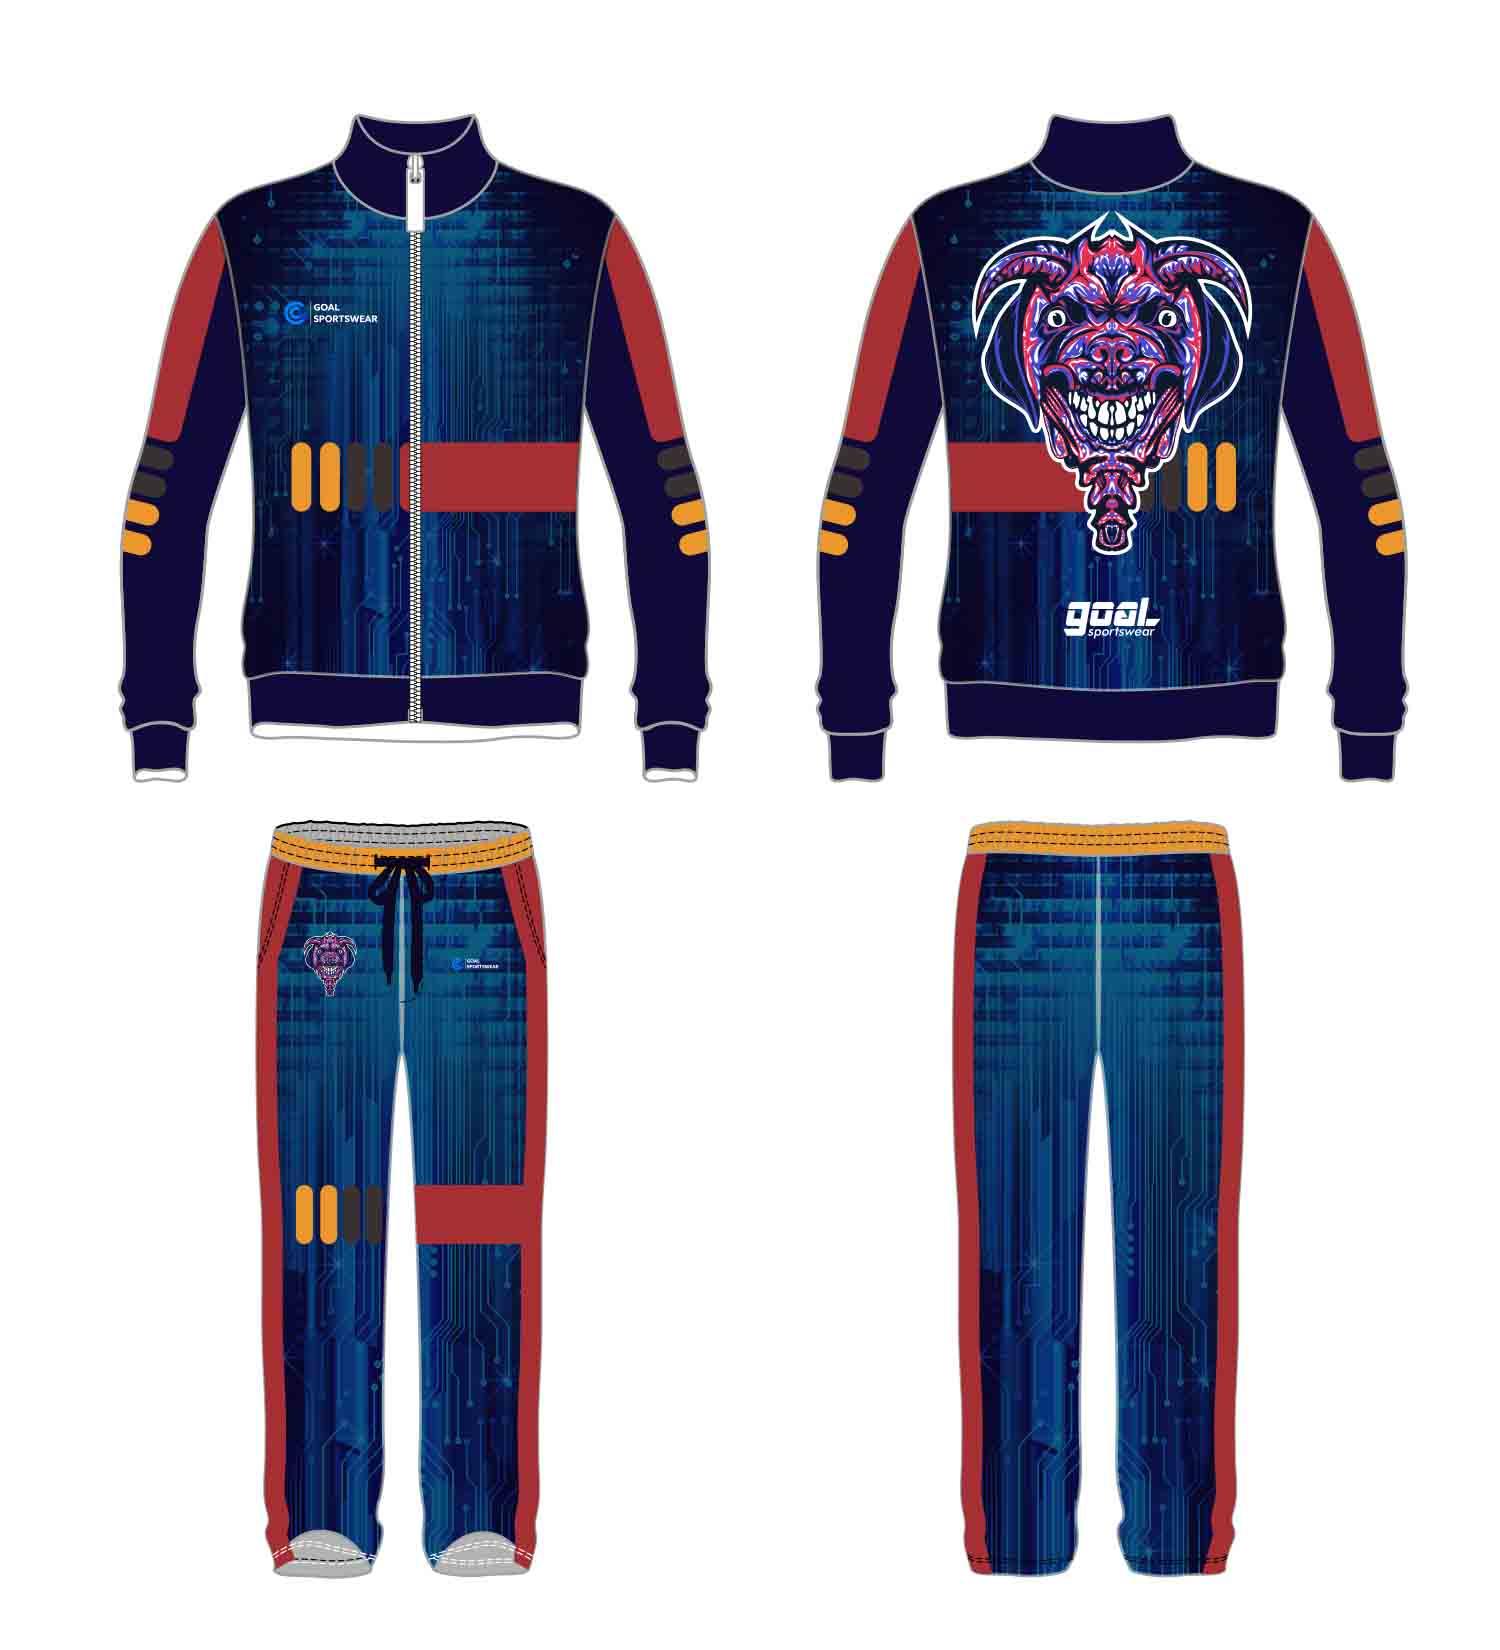 wholesale-100-polyester-custom-sublimated-printed-custom-soccer-warm-ups